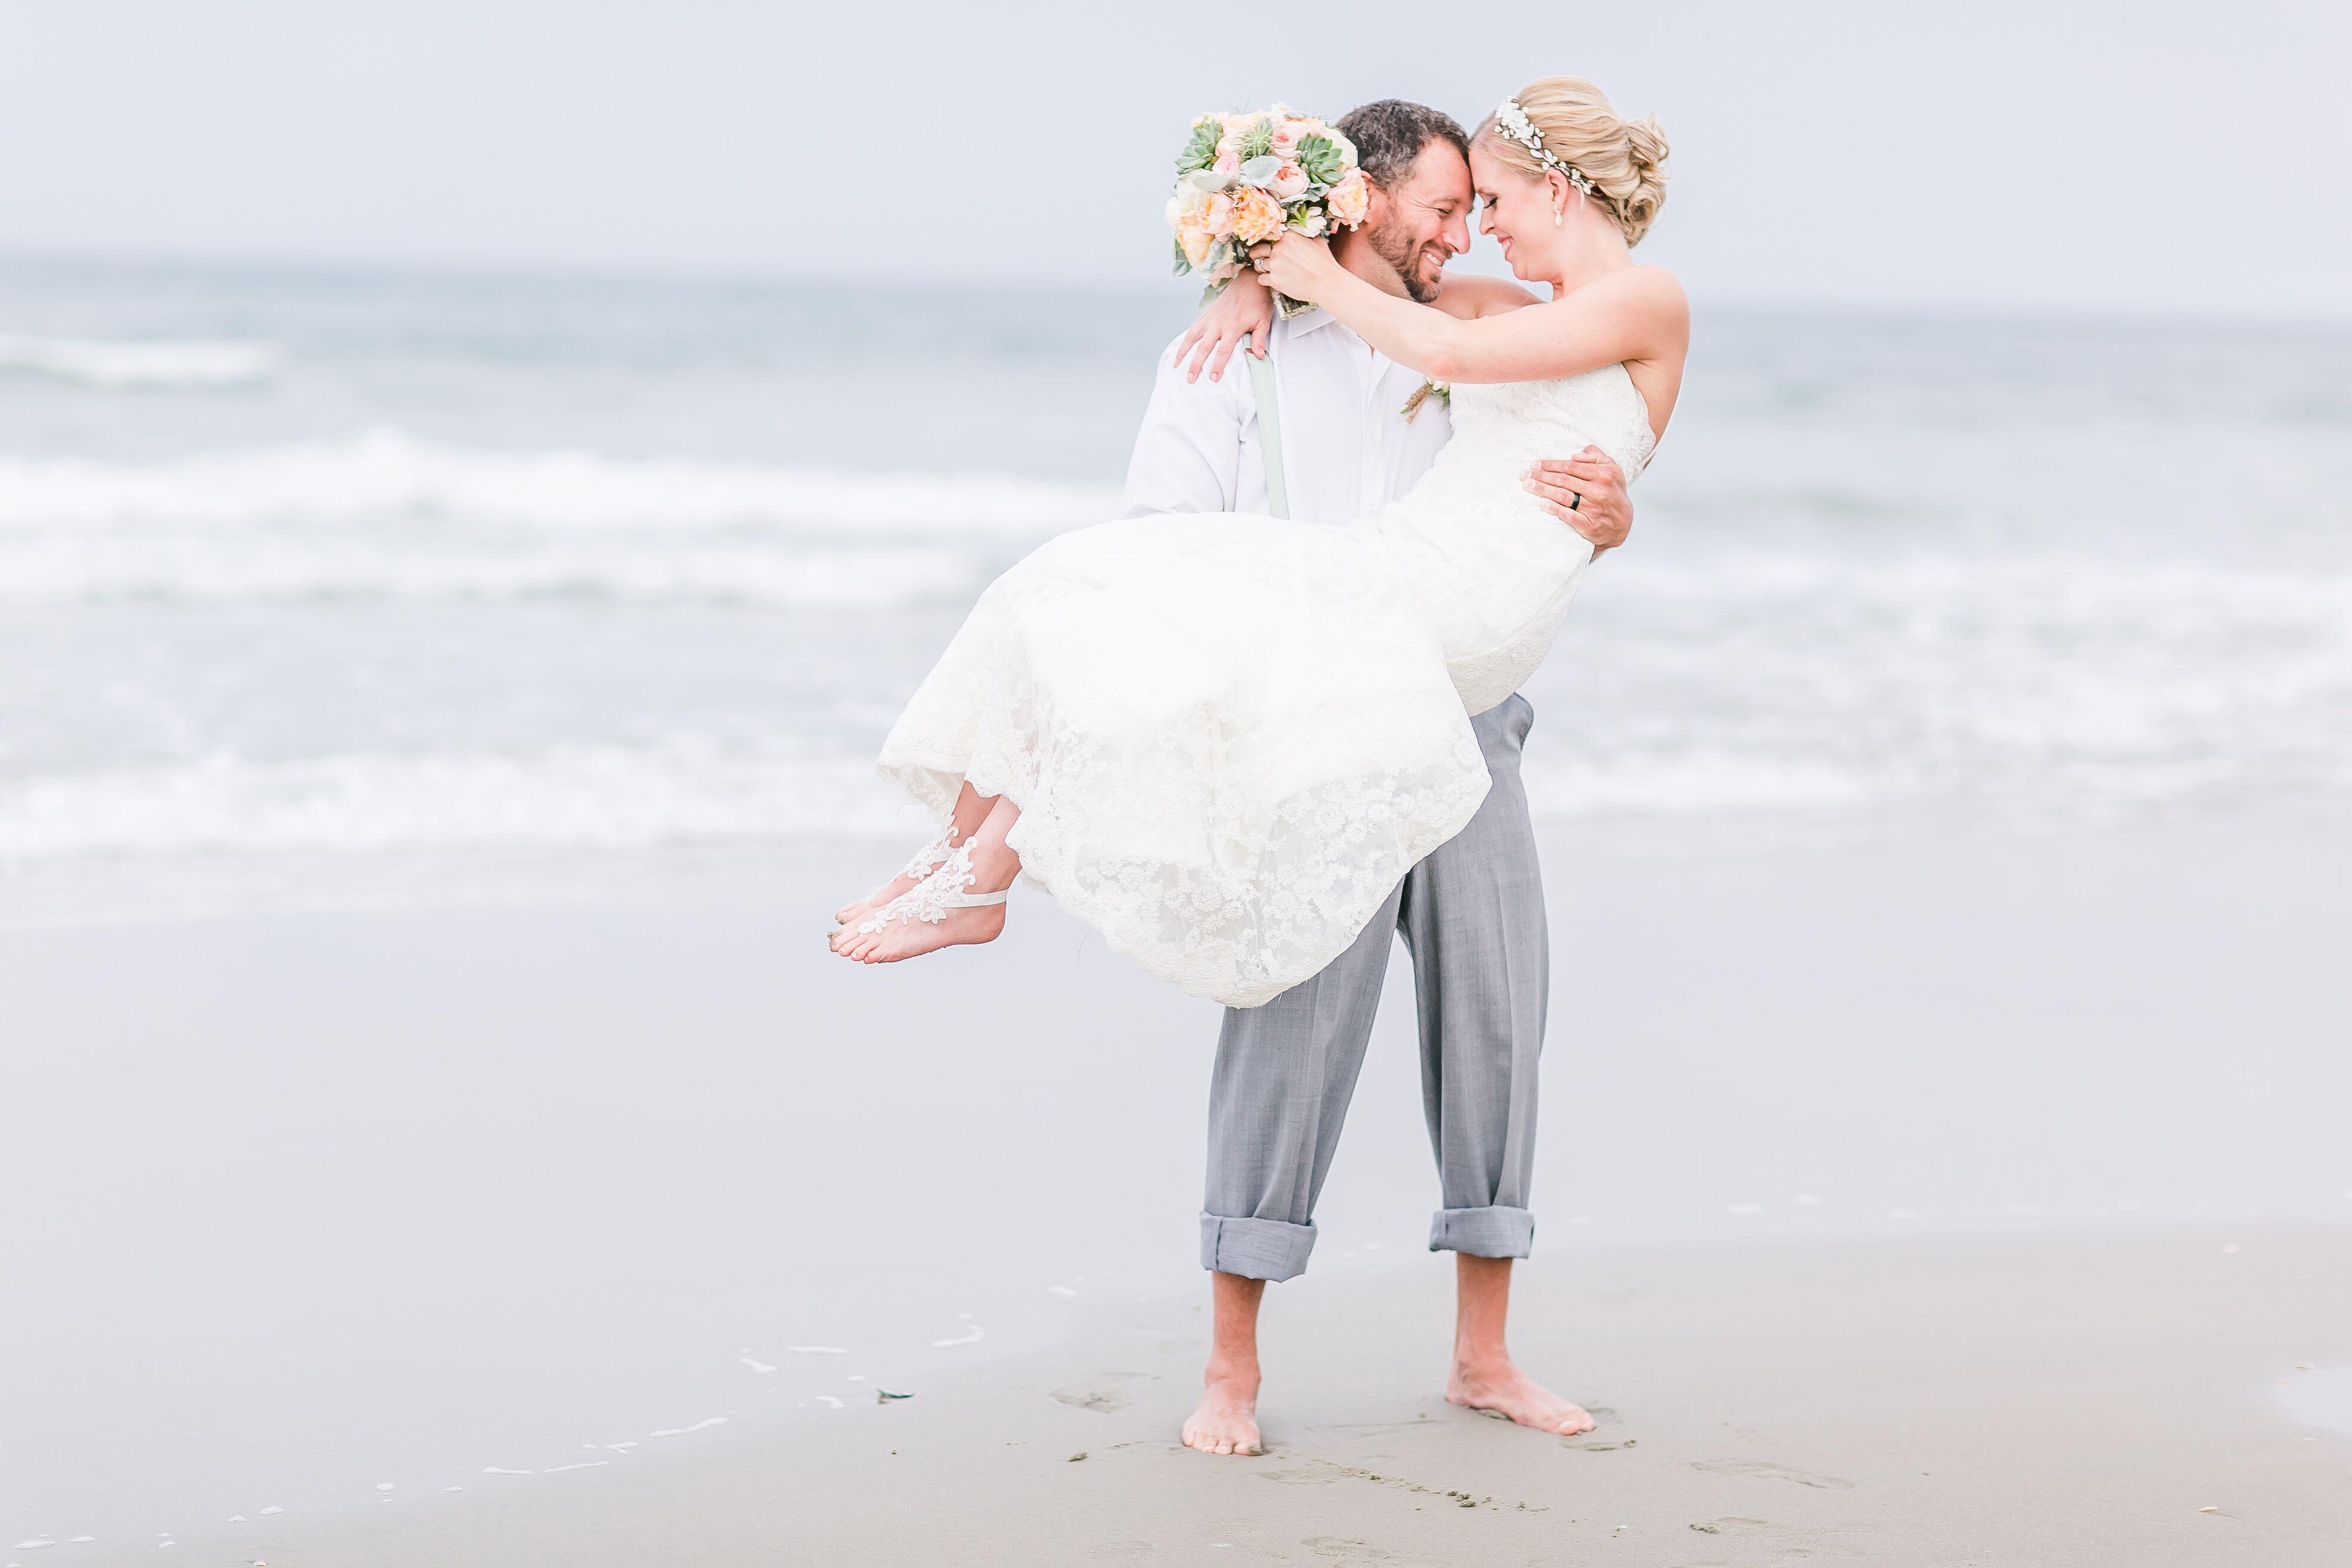 Beach wedding photos a laid back beach wedding at wild horse at swan island estates in corolla north carolina junglespirit Gallery